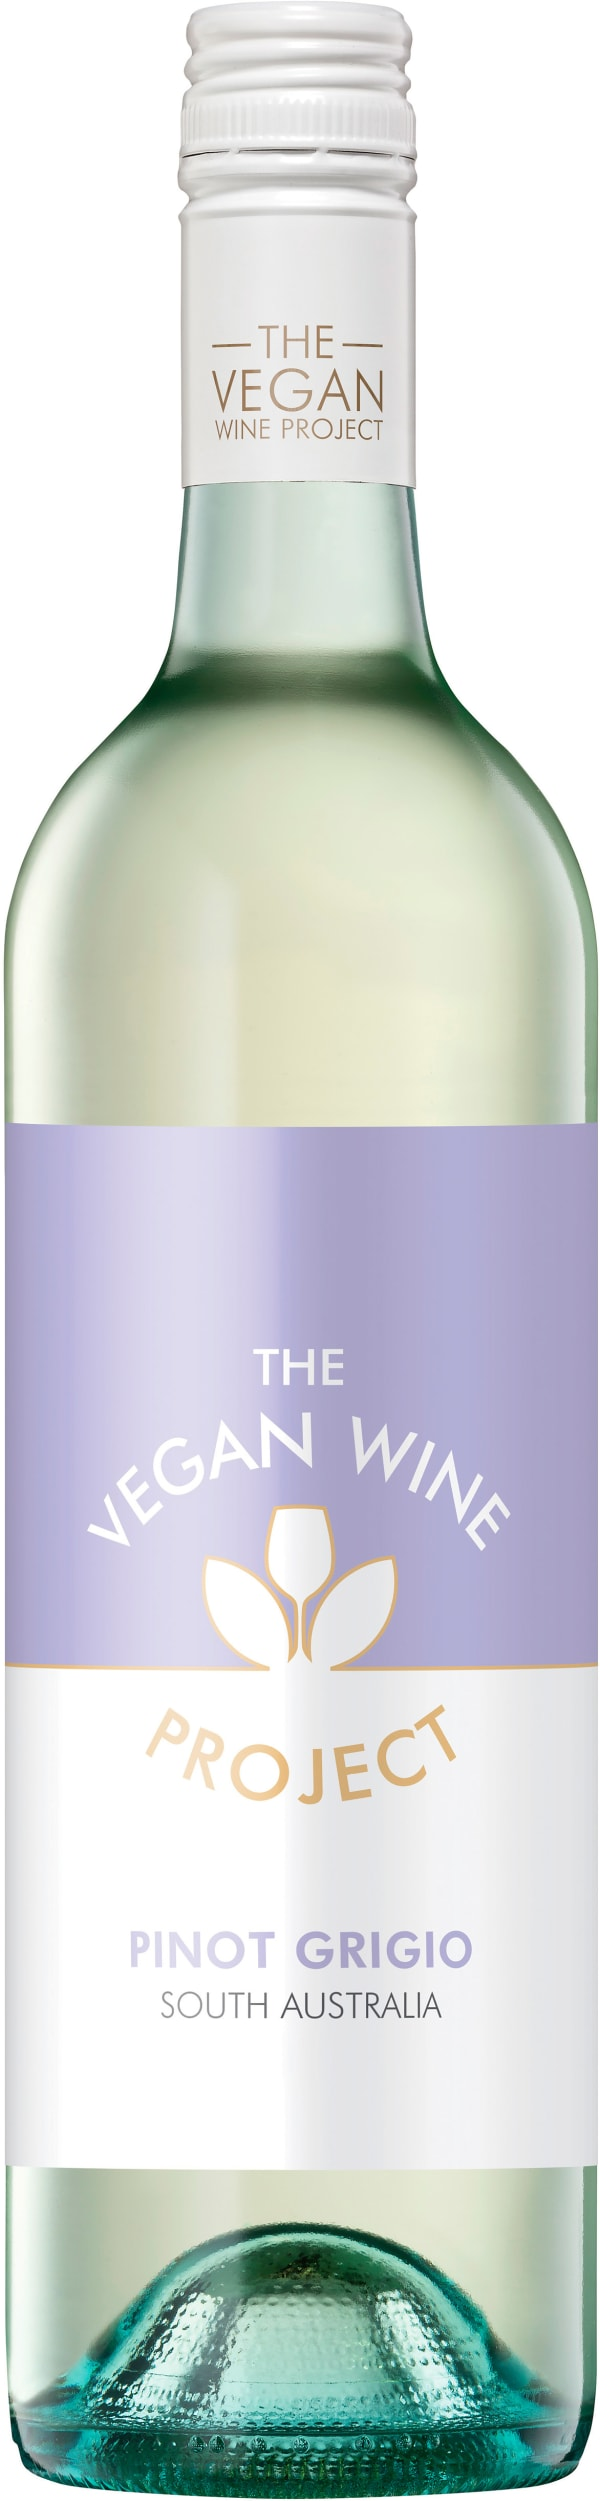 The Vegan Wine Project Pinot Grigio 2020